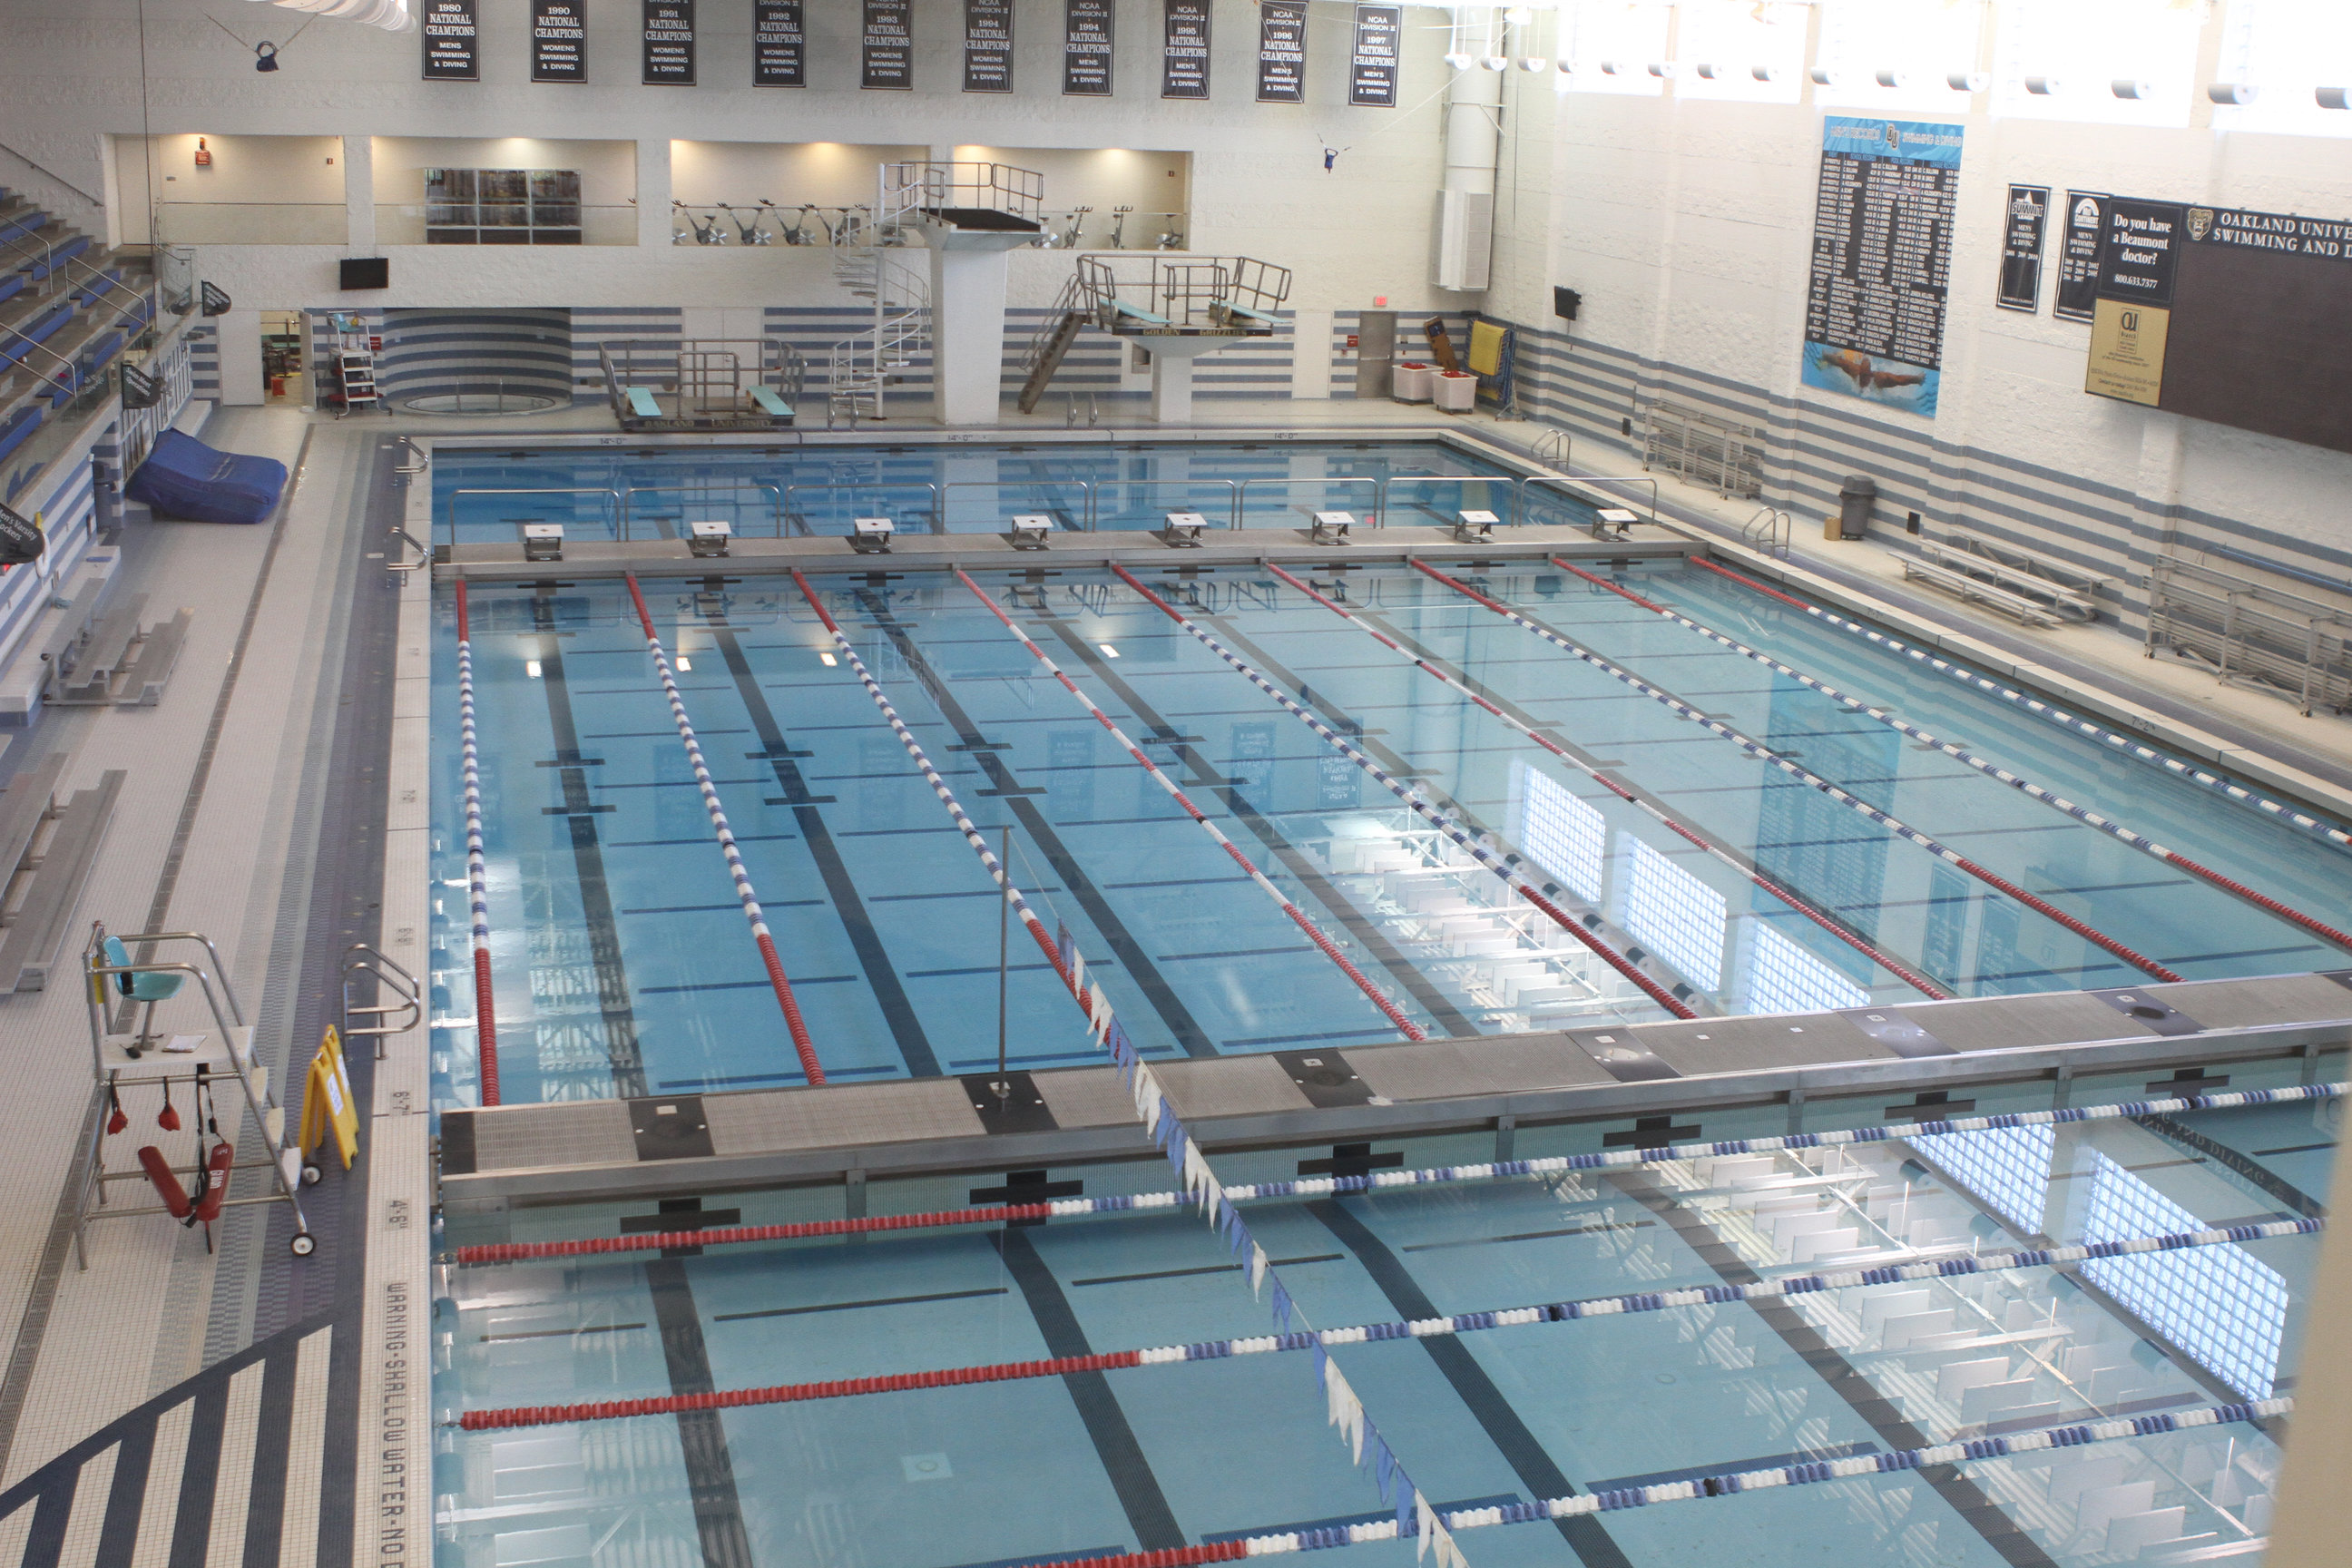 Oakland University Facilities Collegeswimming